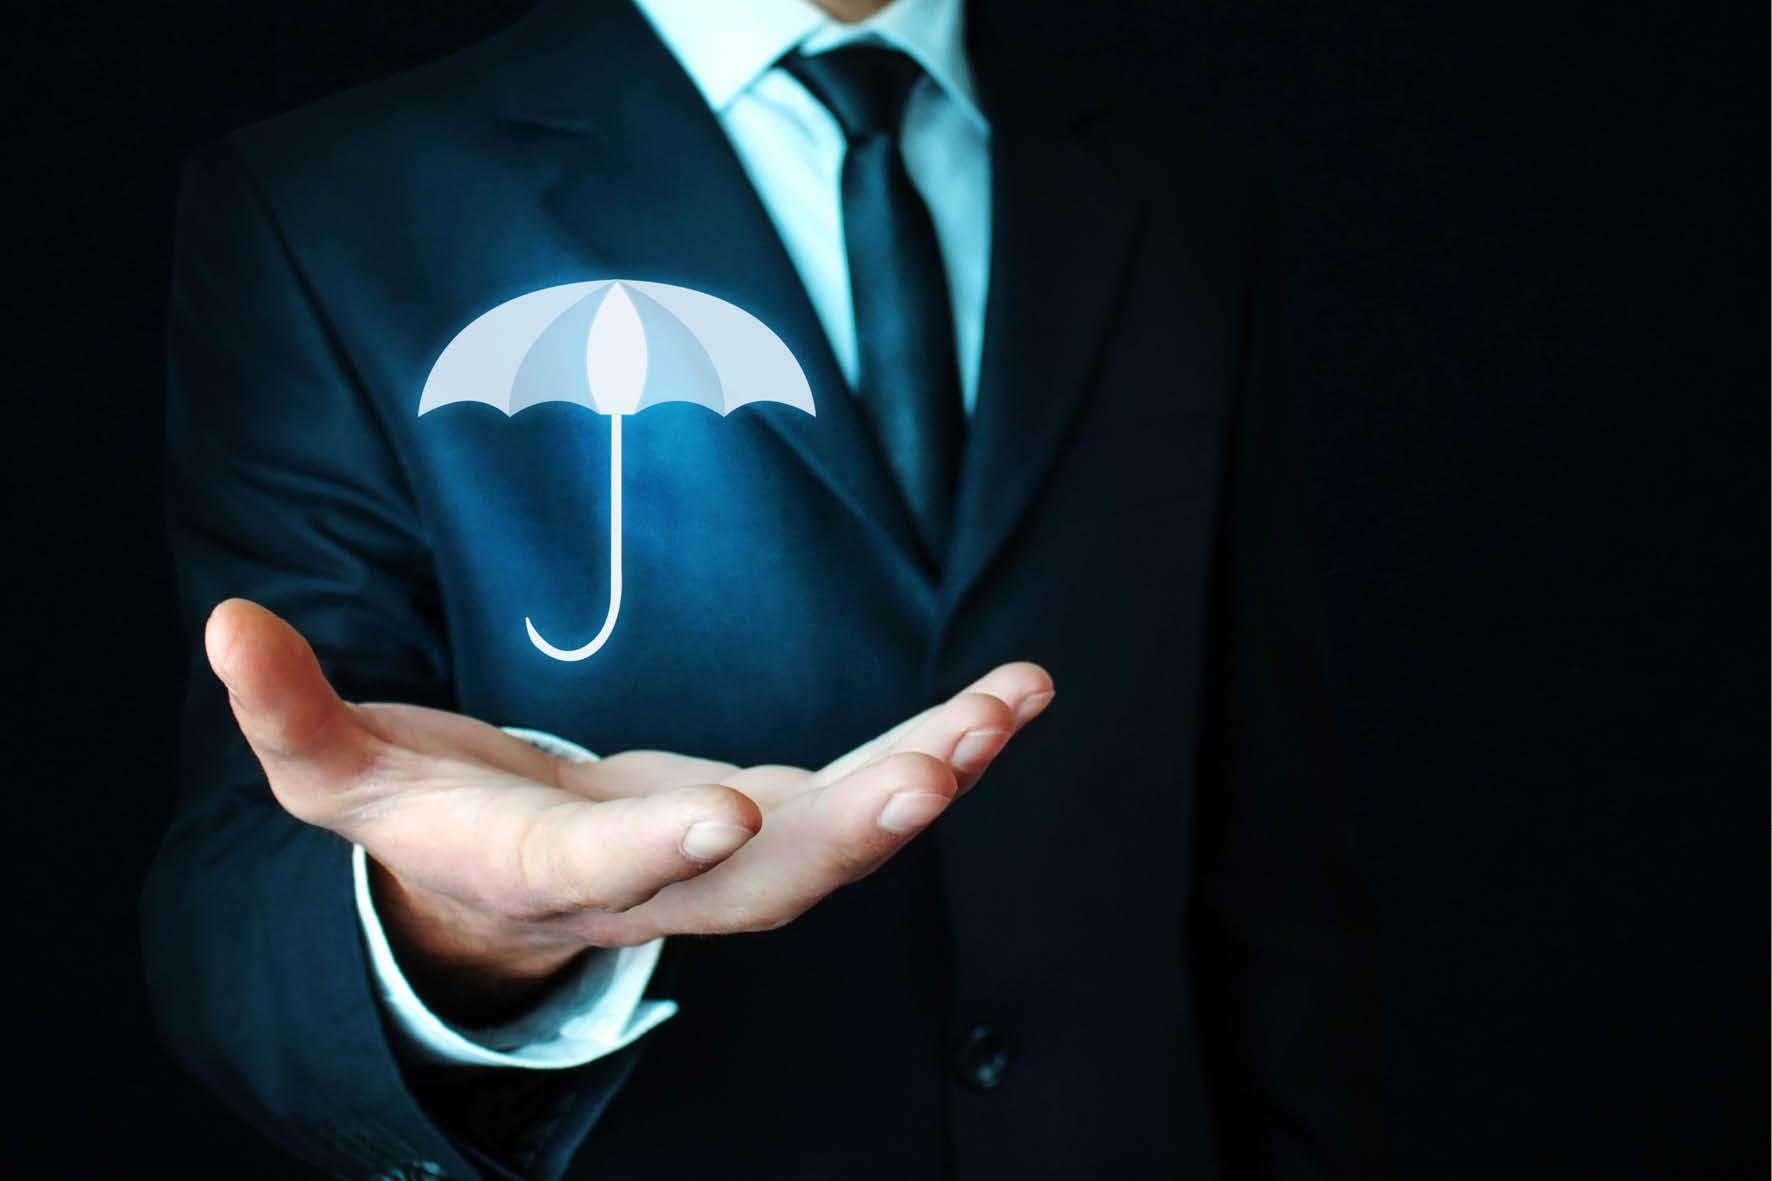 infinityllp_manchester_7_umbrella_services.jpg